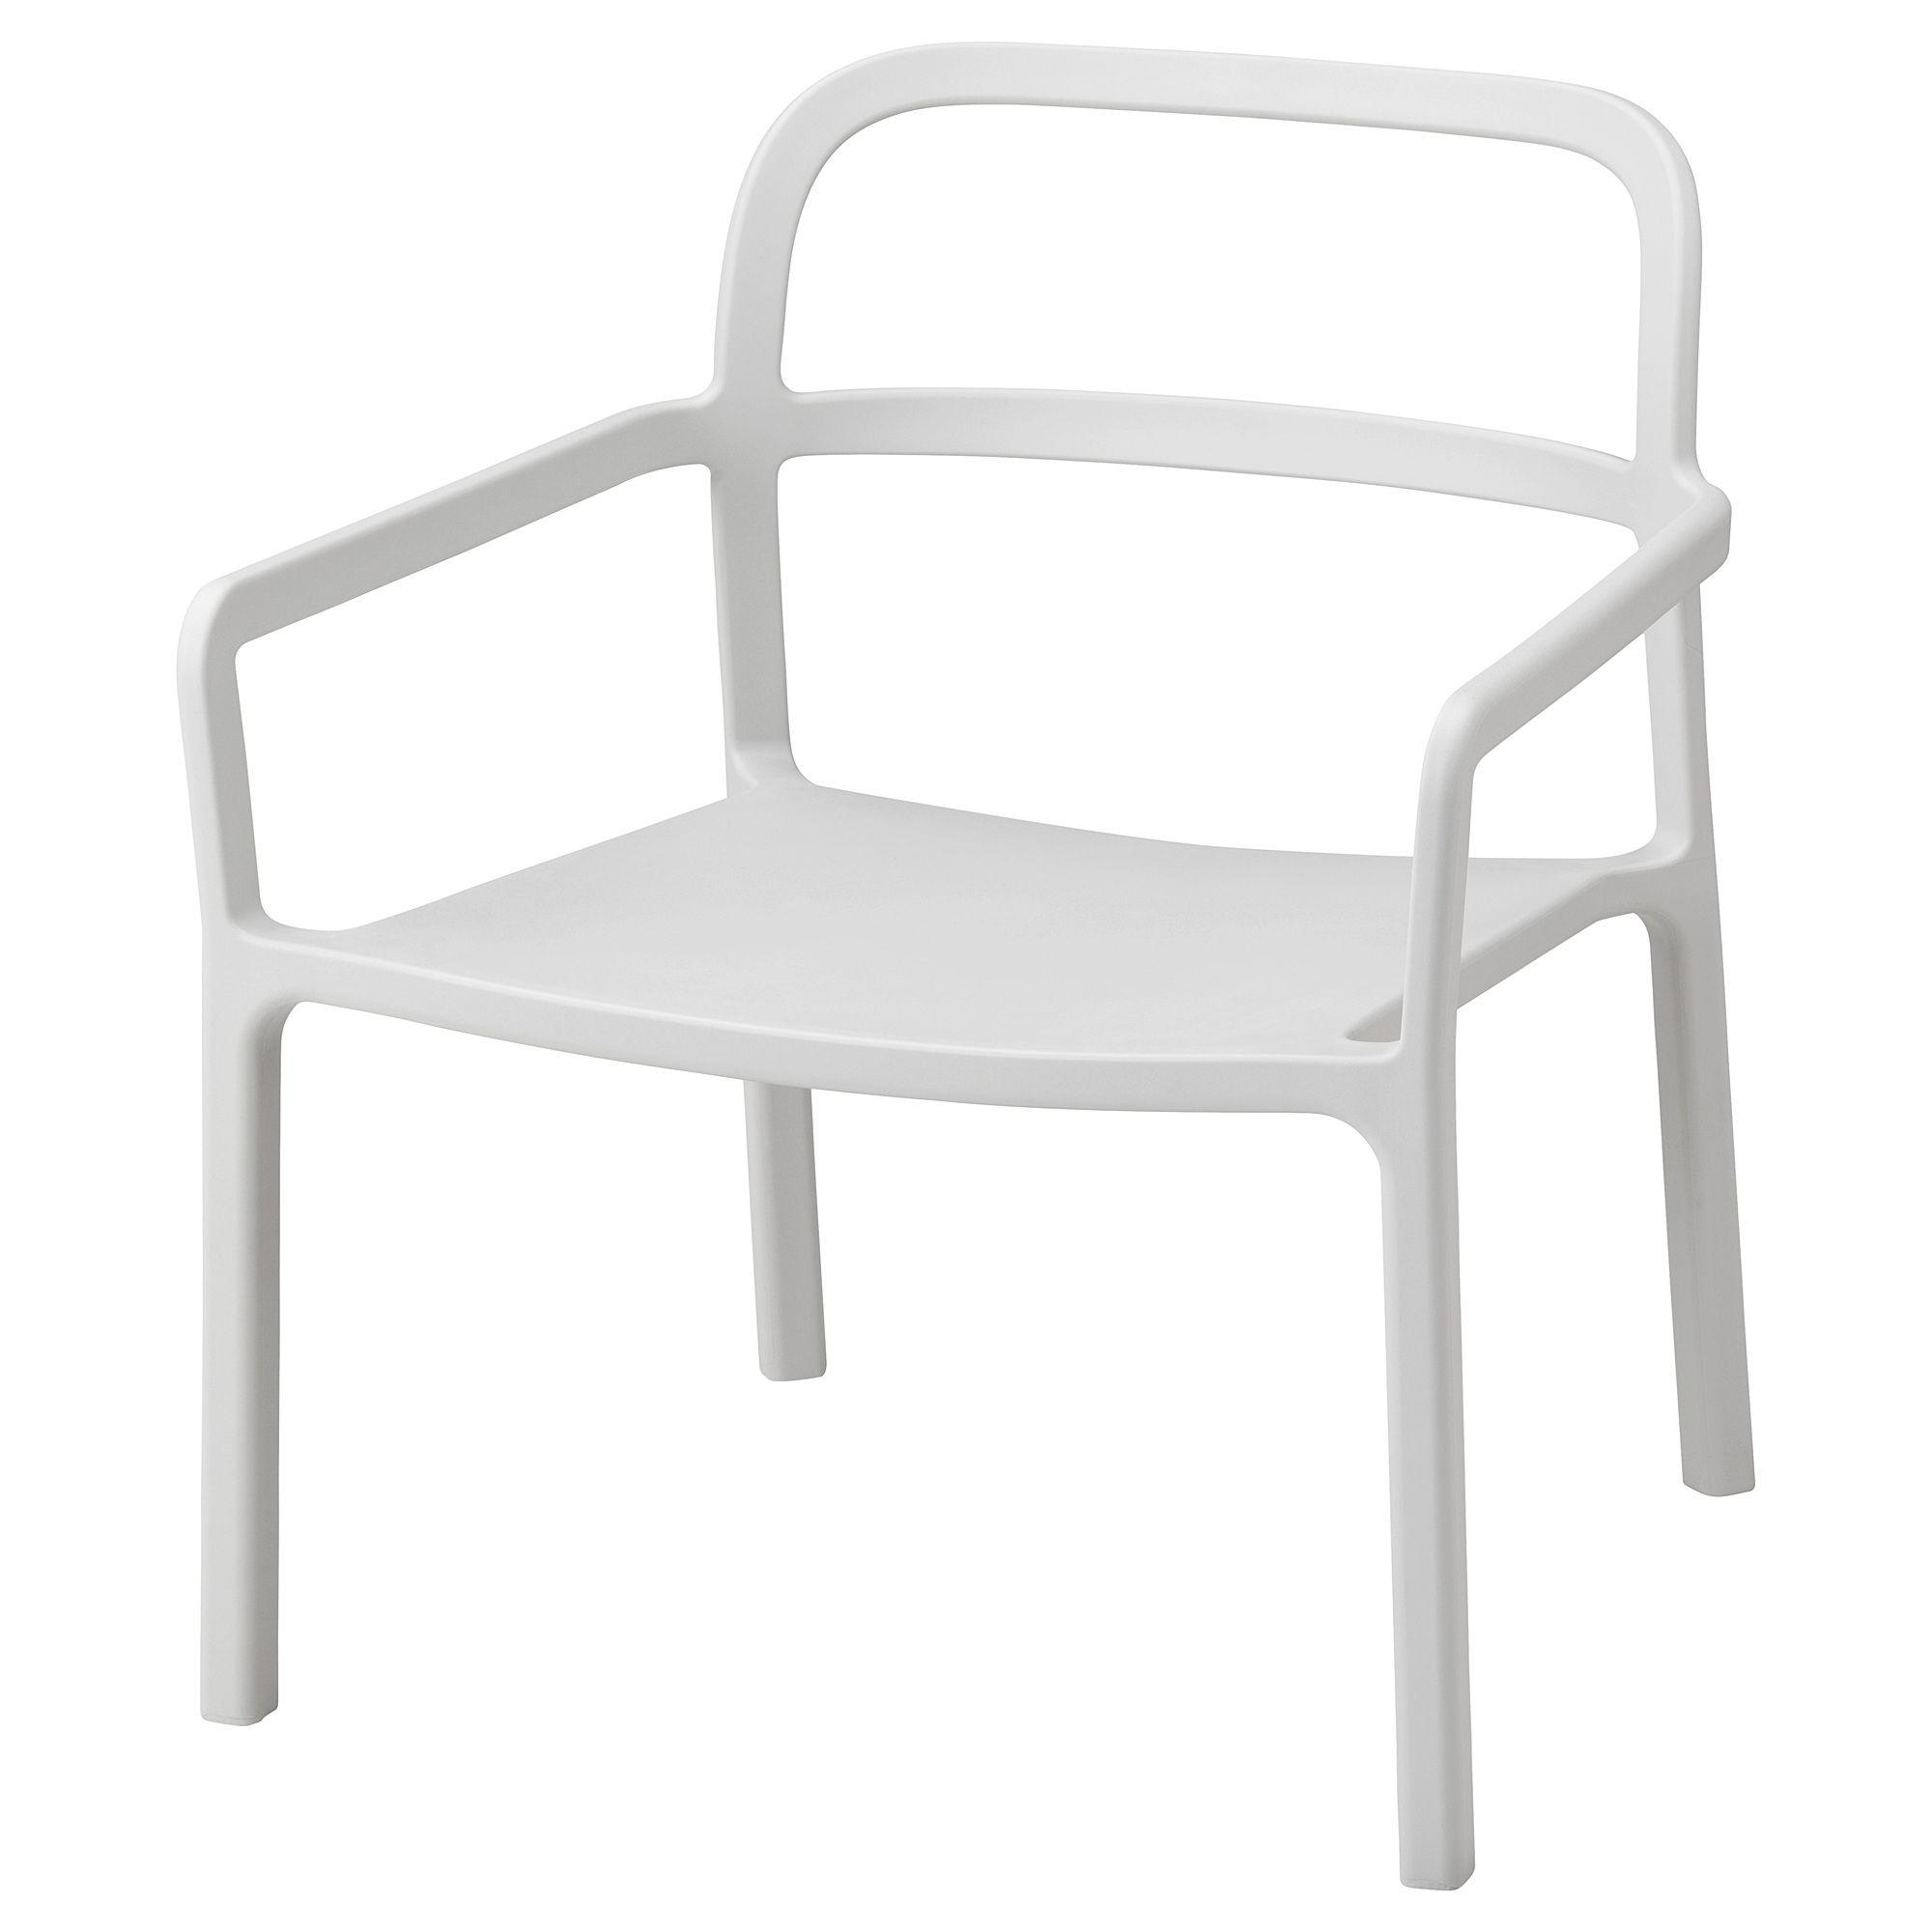 Mobel Einrichtungsideen Fur Dein Zuhause Meubel Ideeen Fauteuil Buitenstoelen